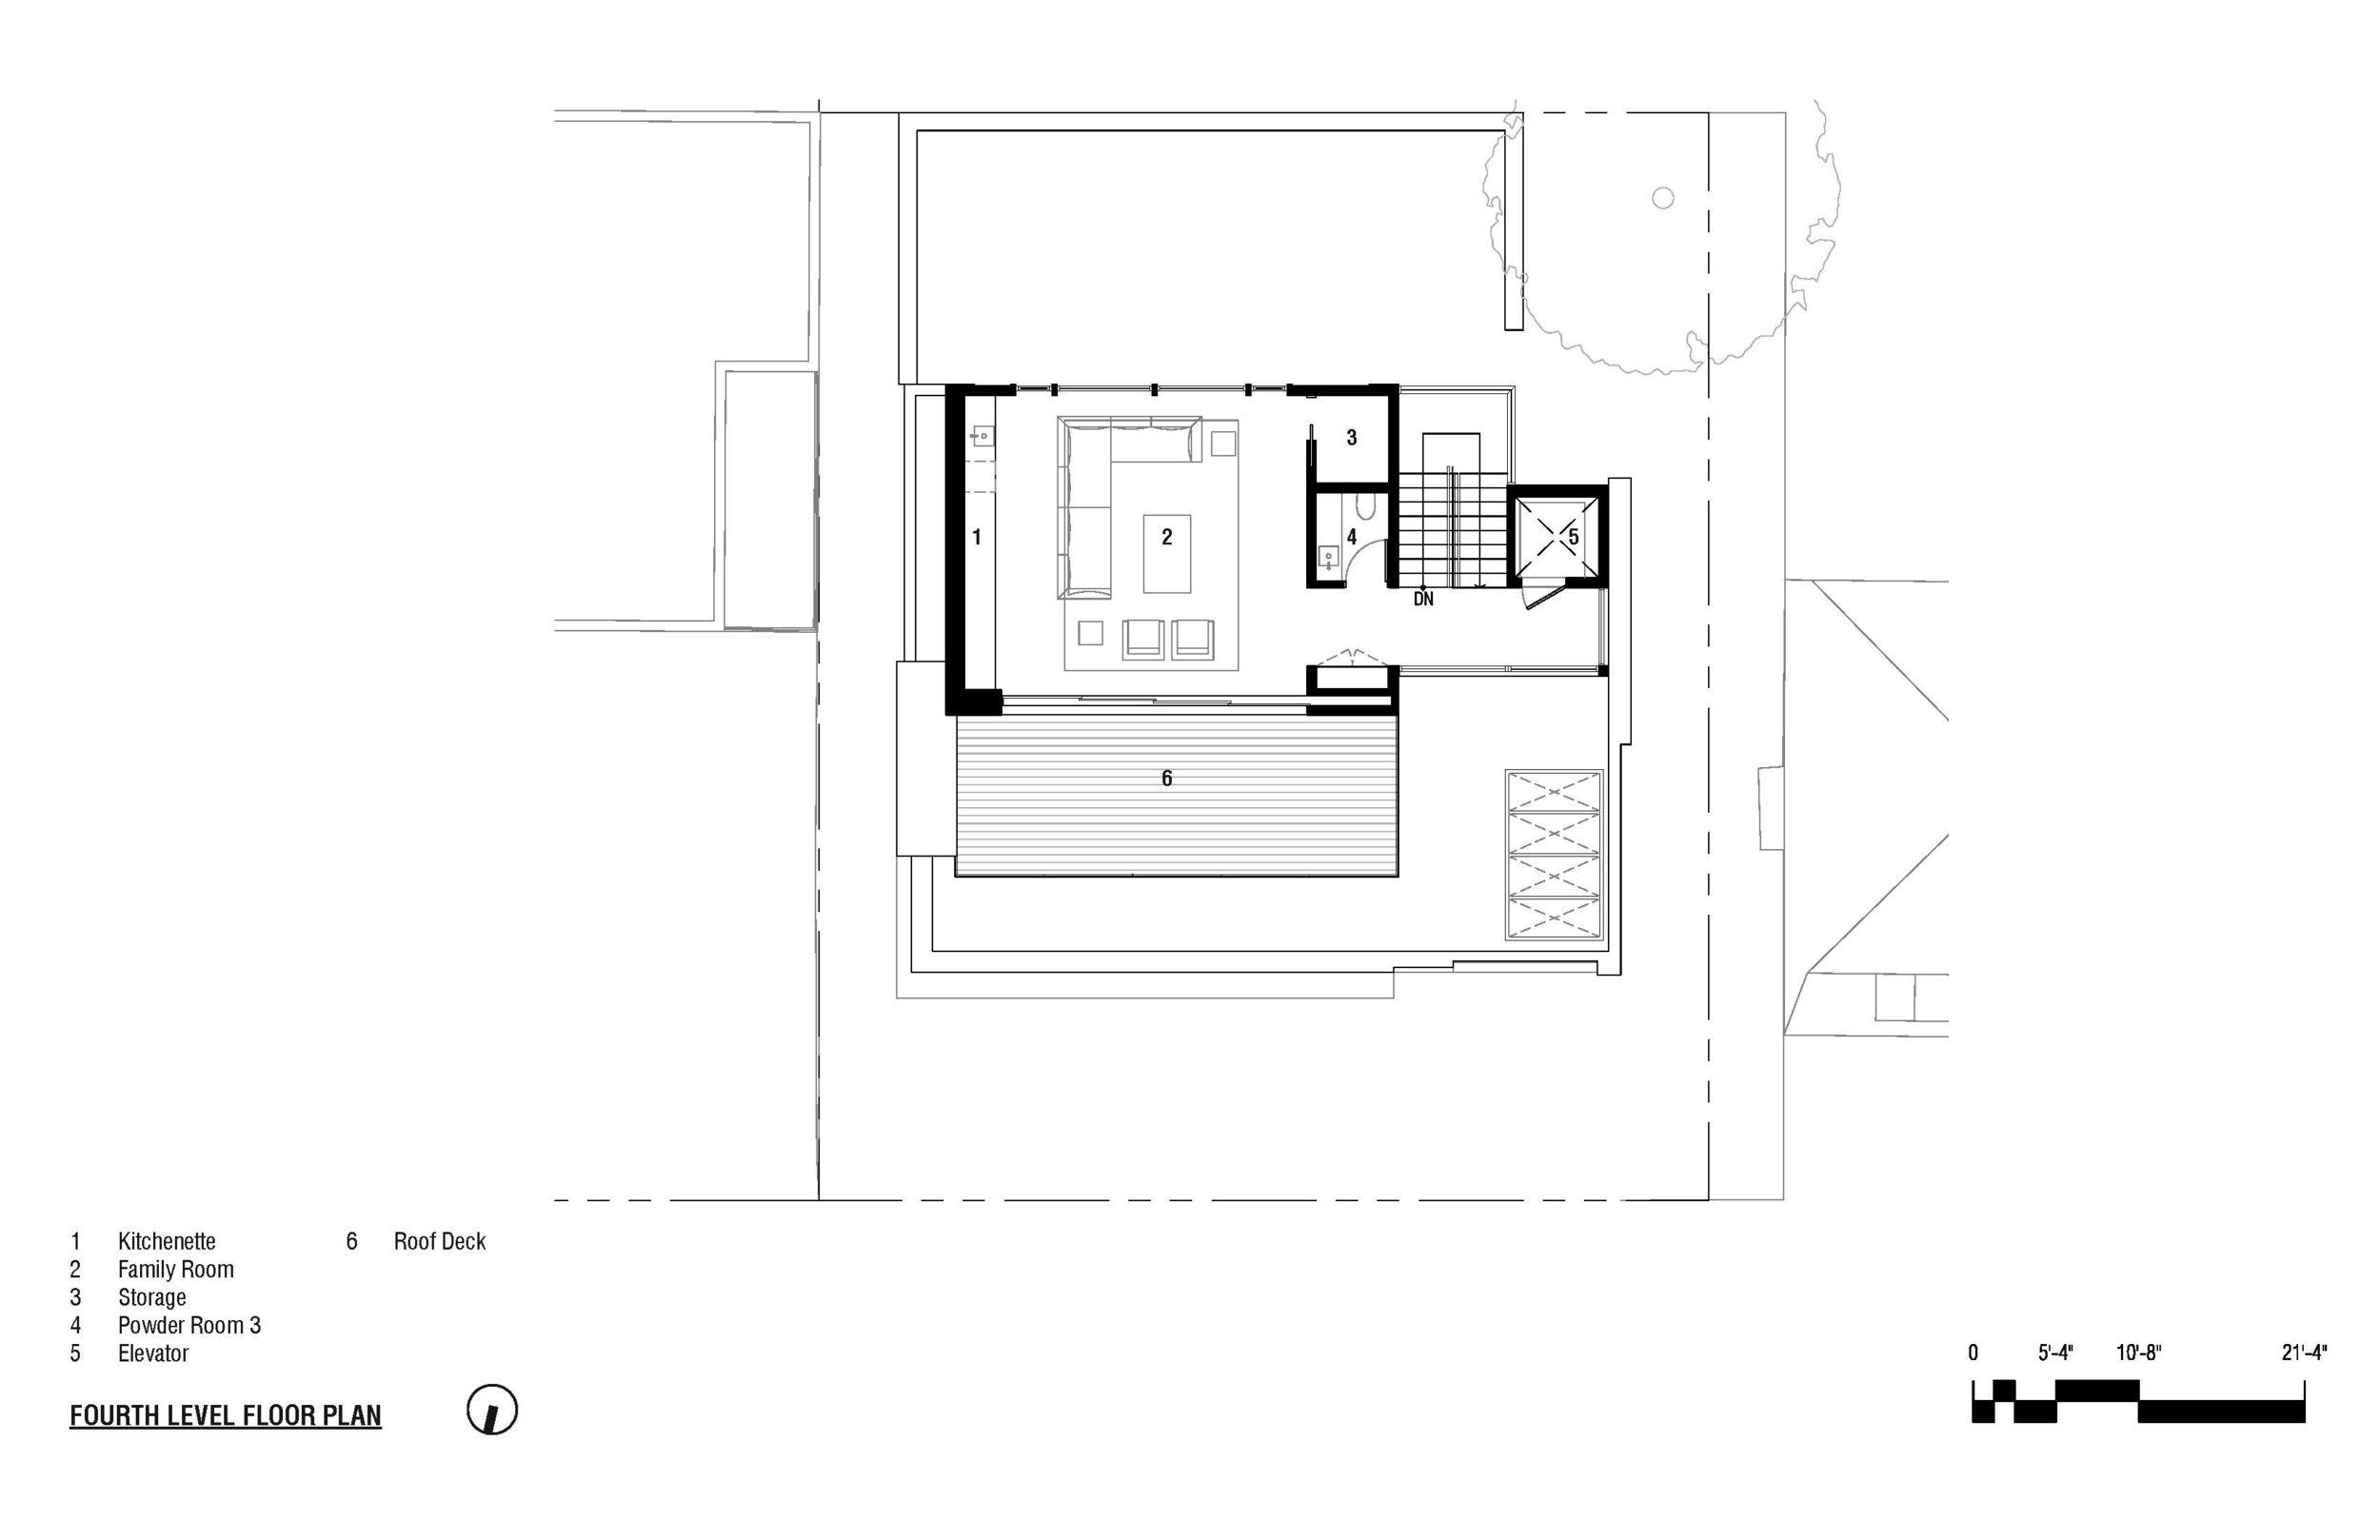 2018-0517 Vallejo- Floor Plan Layouts (1)_Page_5.jpg